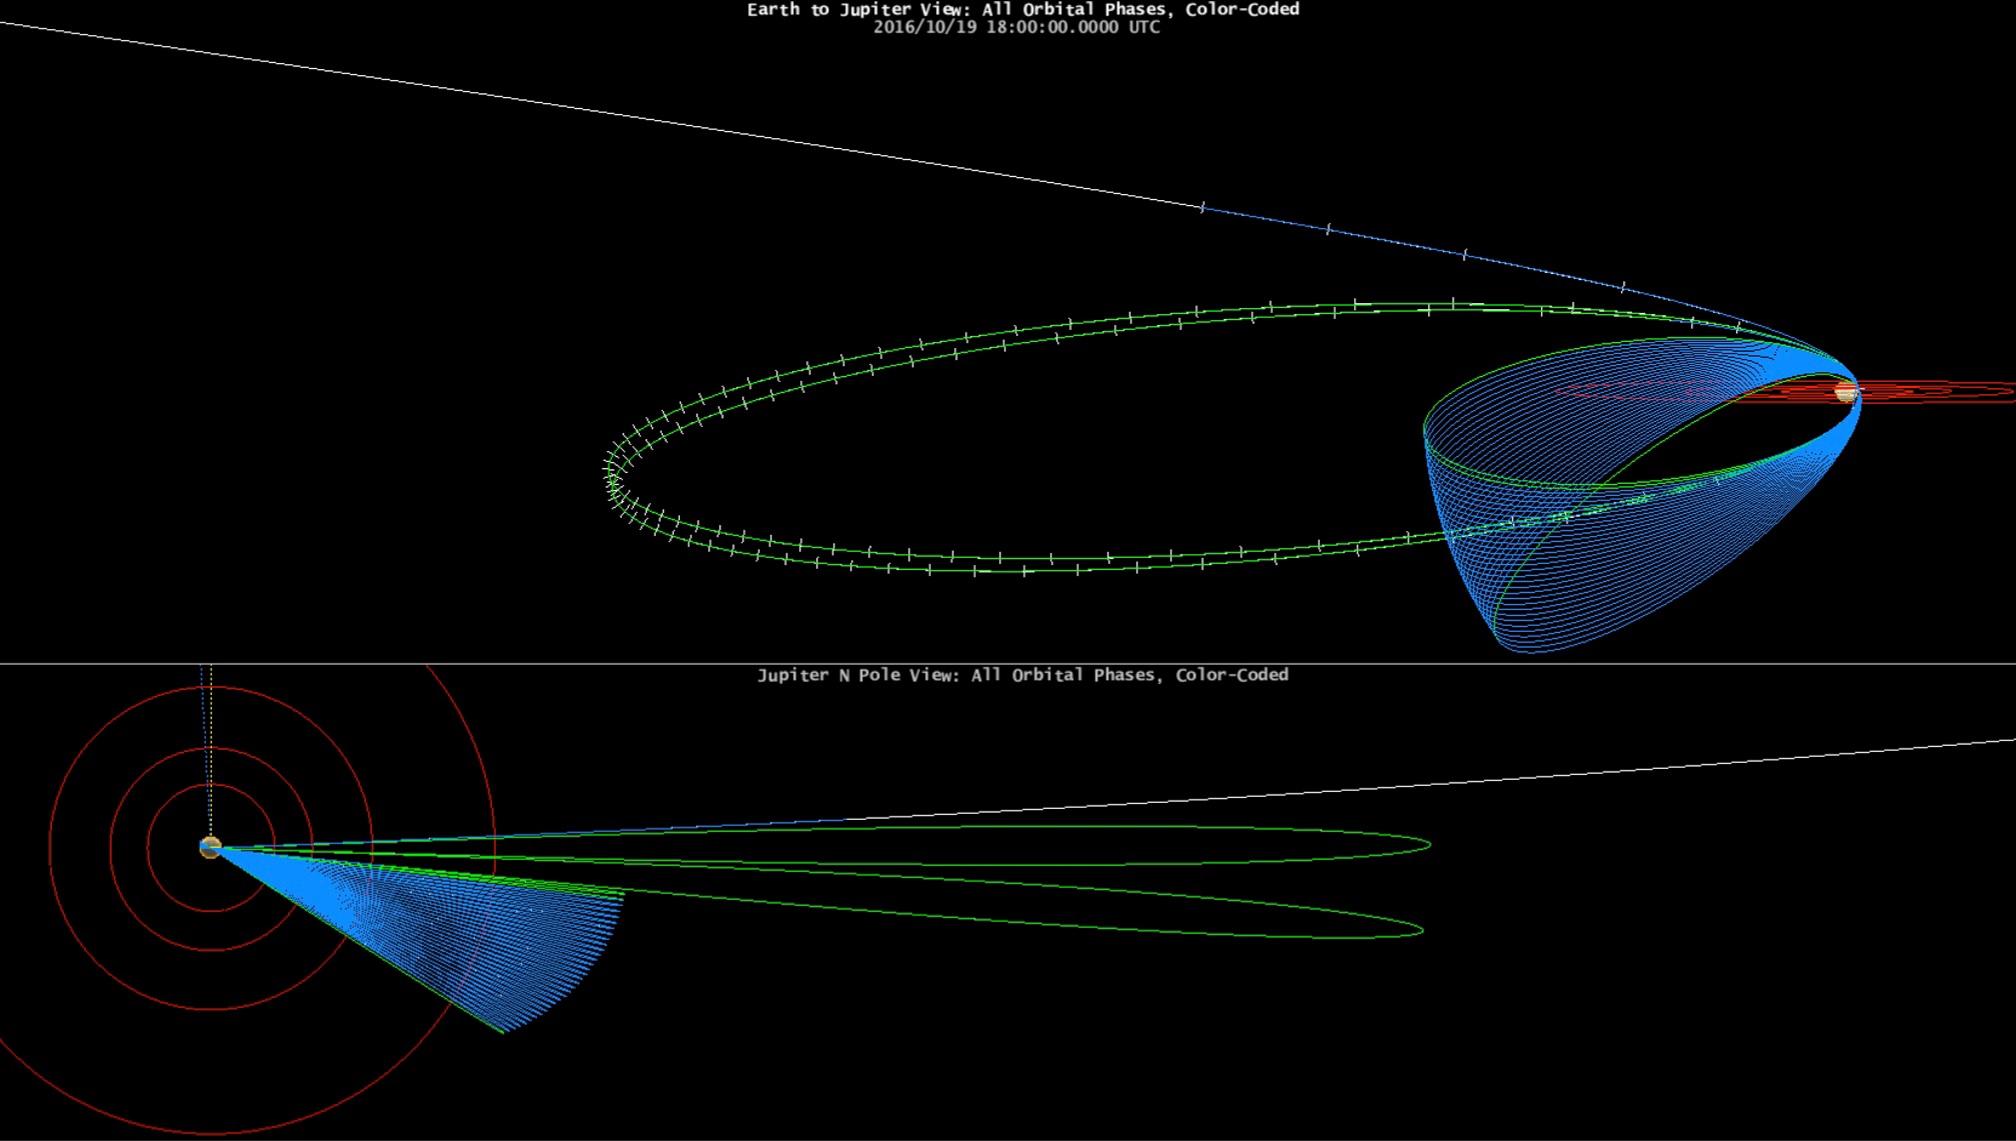 Juno completes closest Pass of Jupiter ahead of Orbital Trim